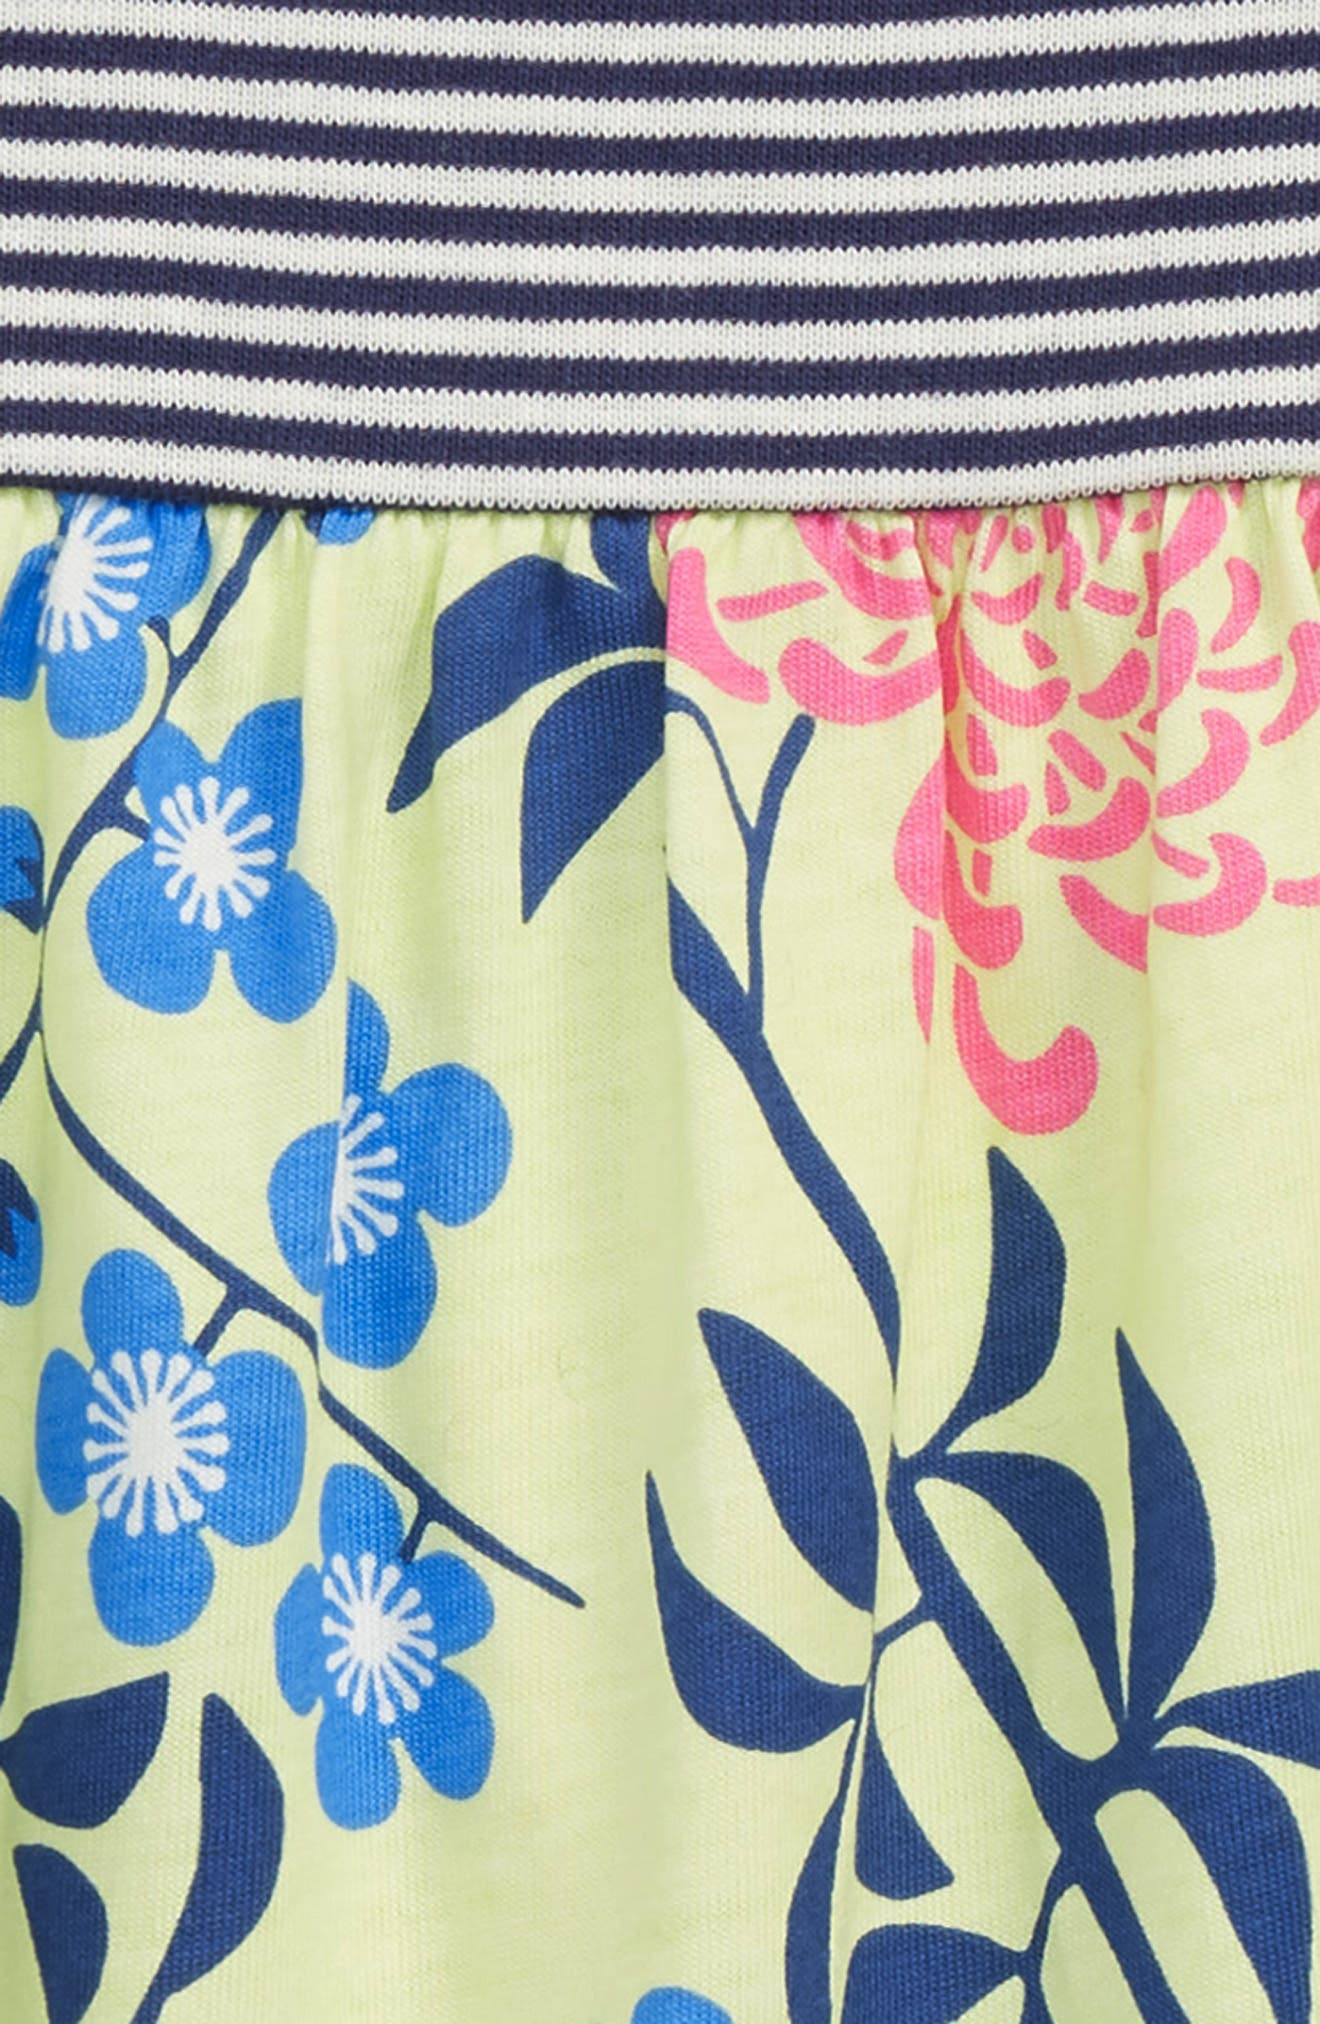 Mix Print Romper,                             Alternate thumbnail 2, color,                             Chrysanthemum Blossoms